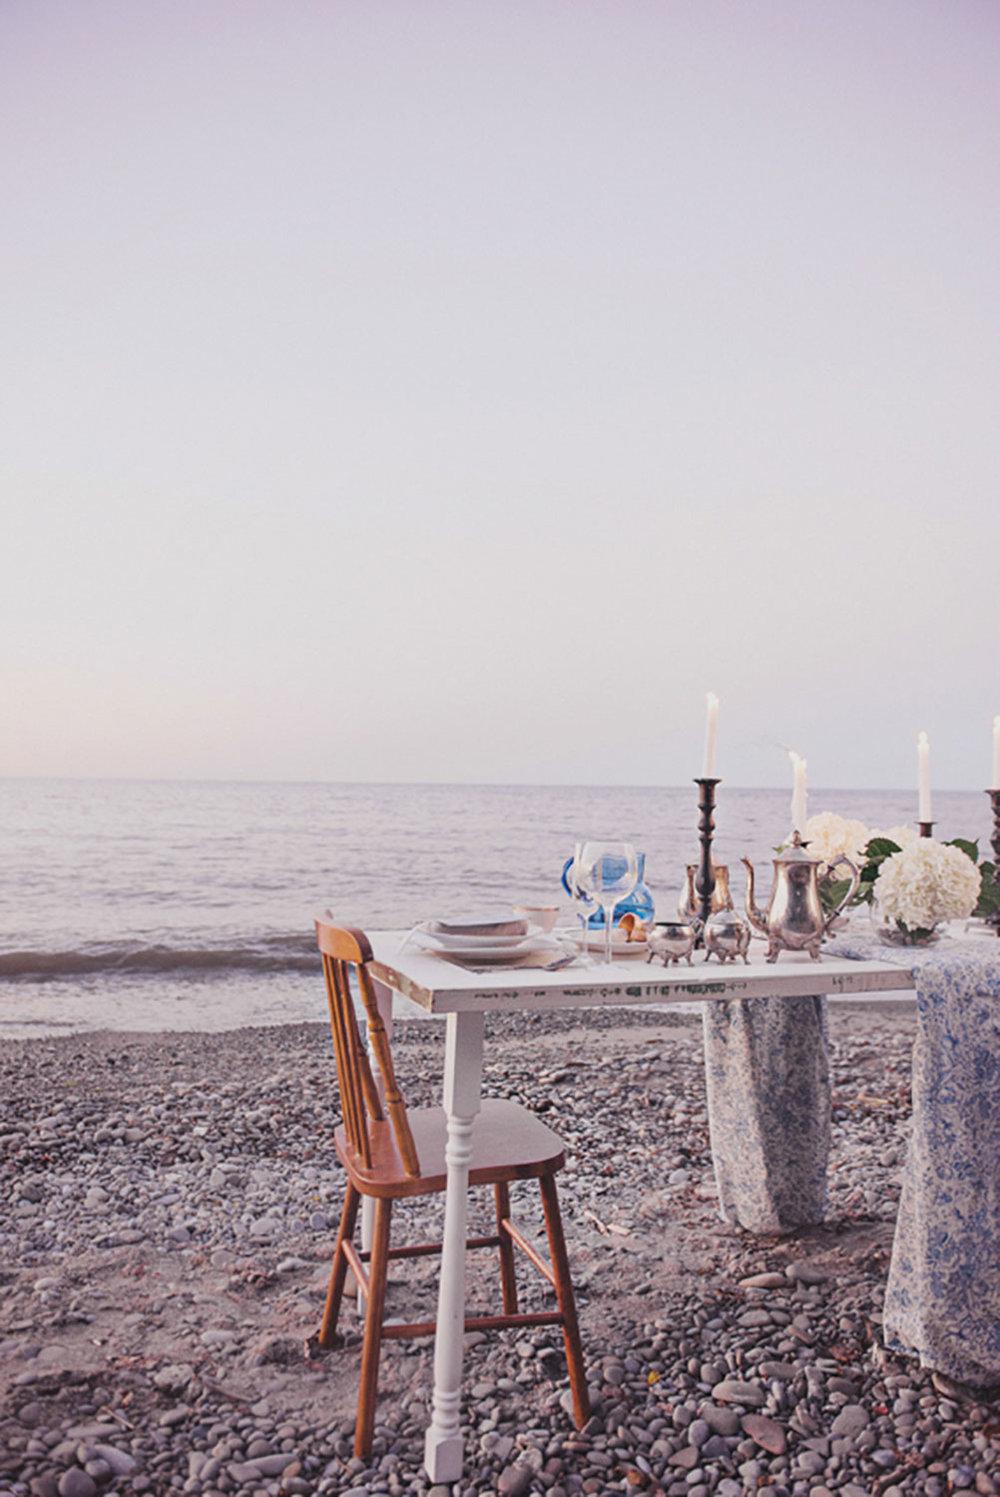 Grimbsy-Beach-Editorial-Vineyard-Bride-photo-by-Destiny-Dawn-Photography-039.JPG